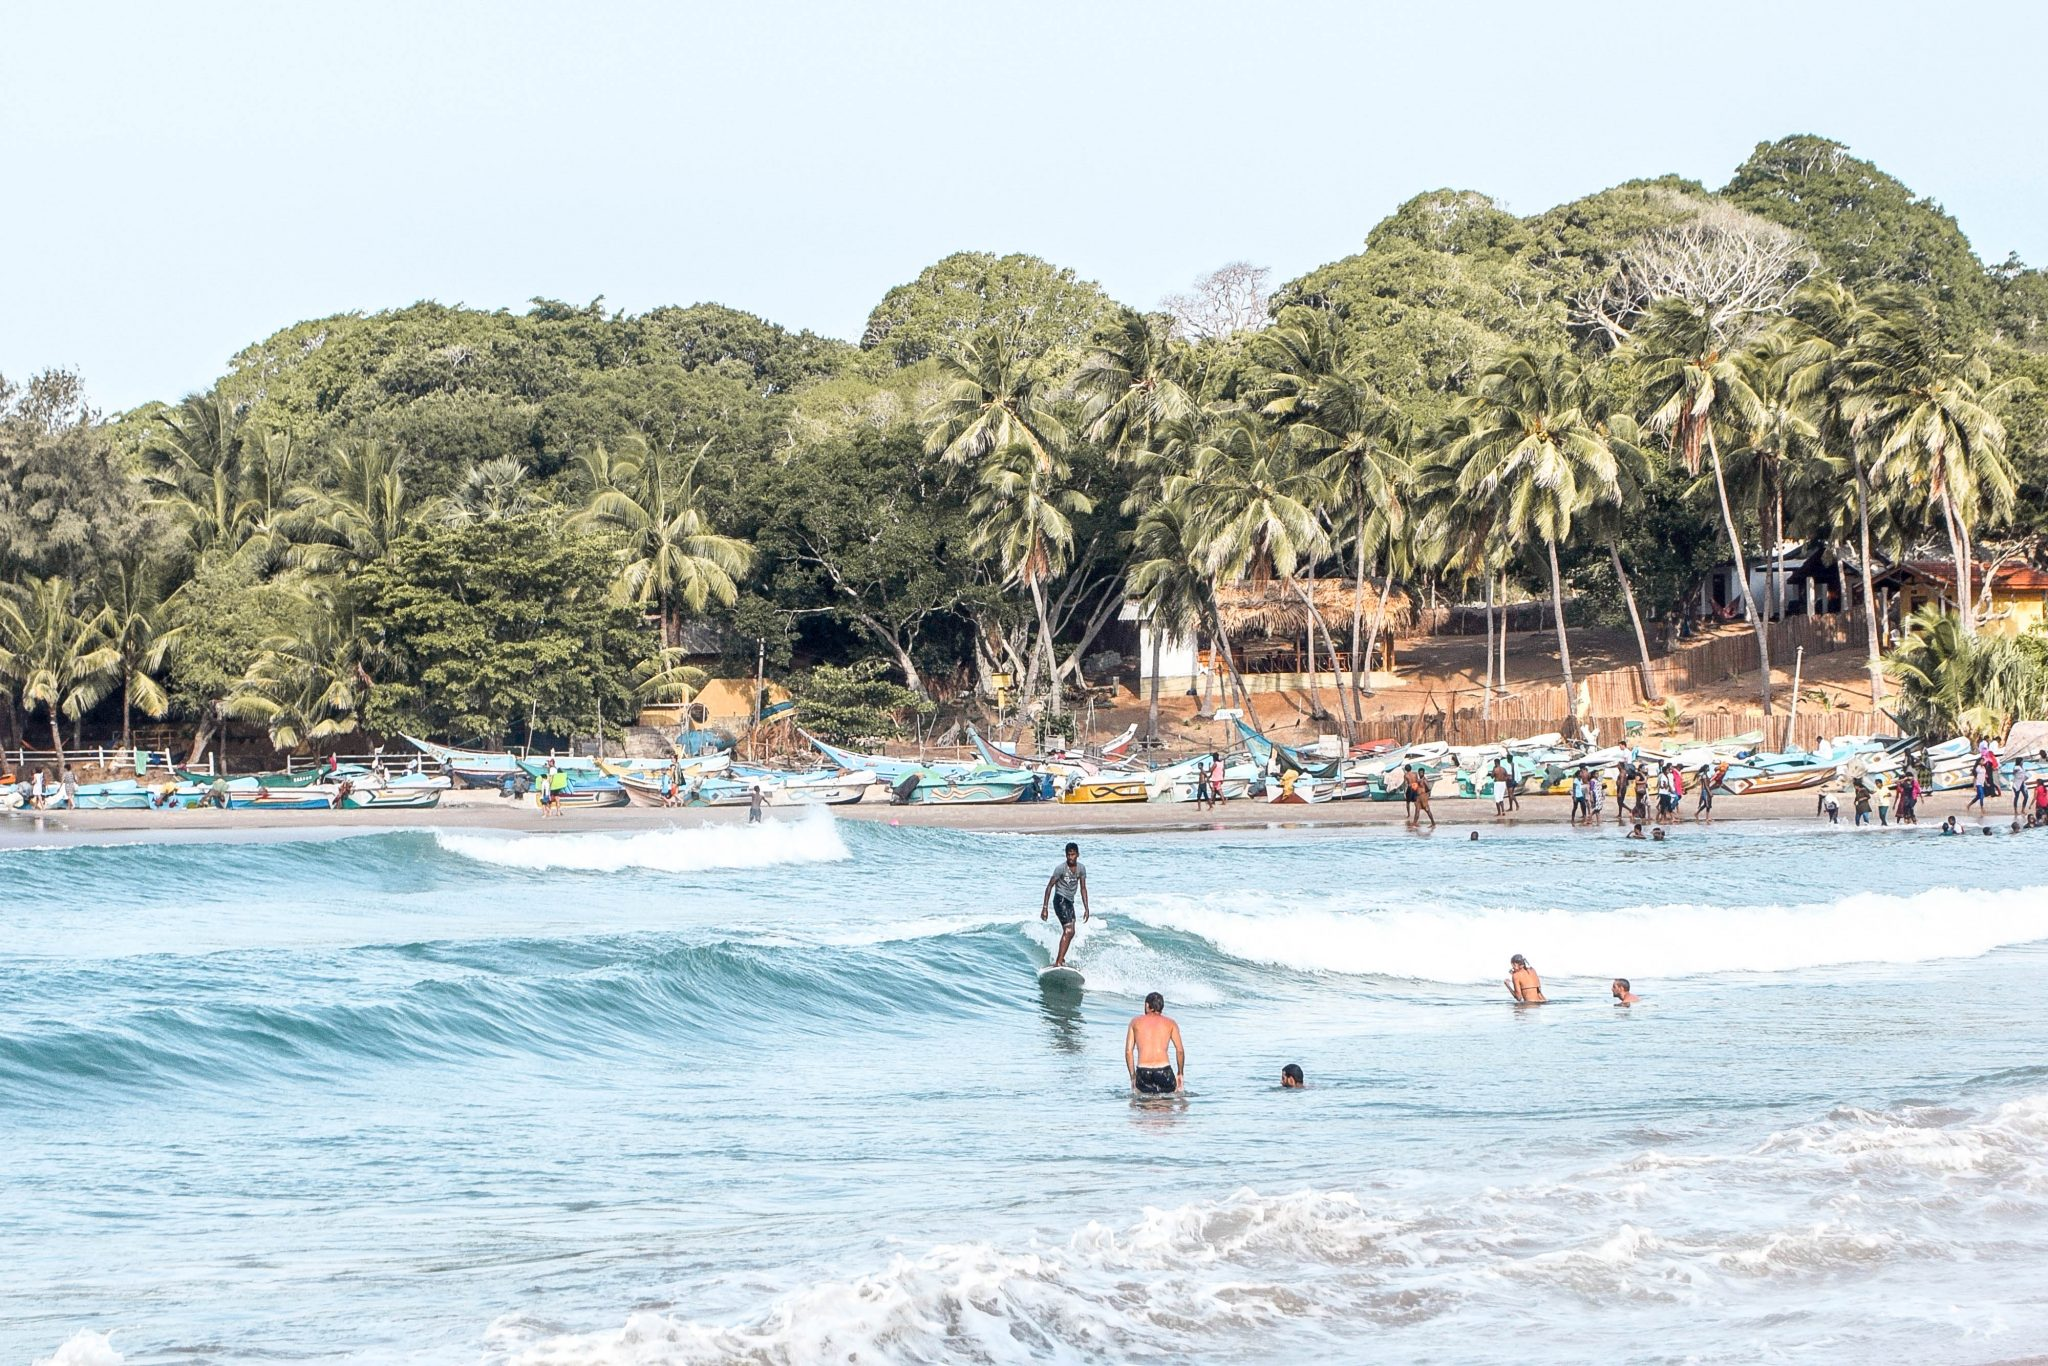 Wanderers & Warriors - Best Surf Spots In Sri Lanka Surf Spots - Things To Do In Arugam Bay Sri Lanka - Surfing Arugam Bay Beach